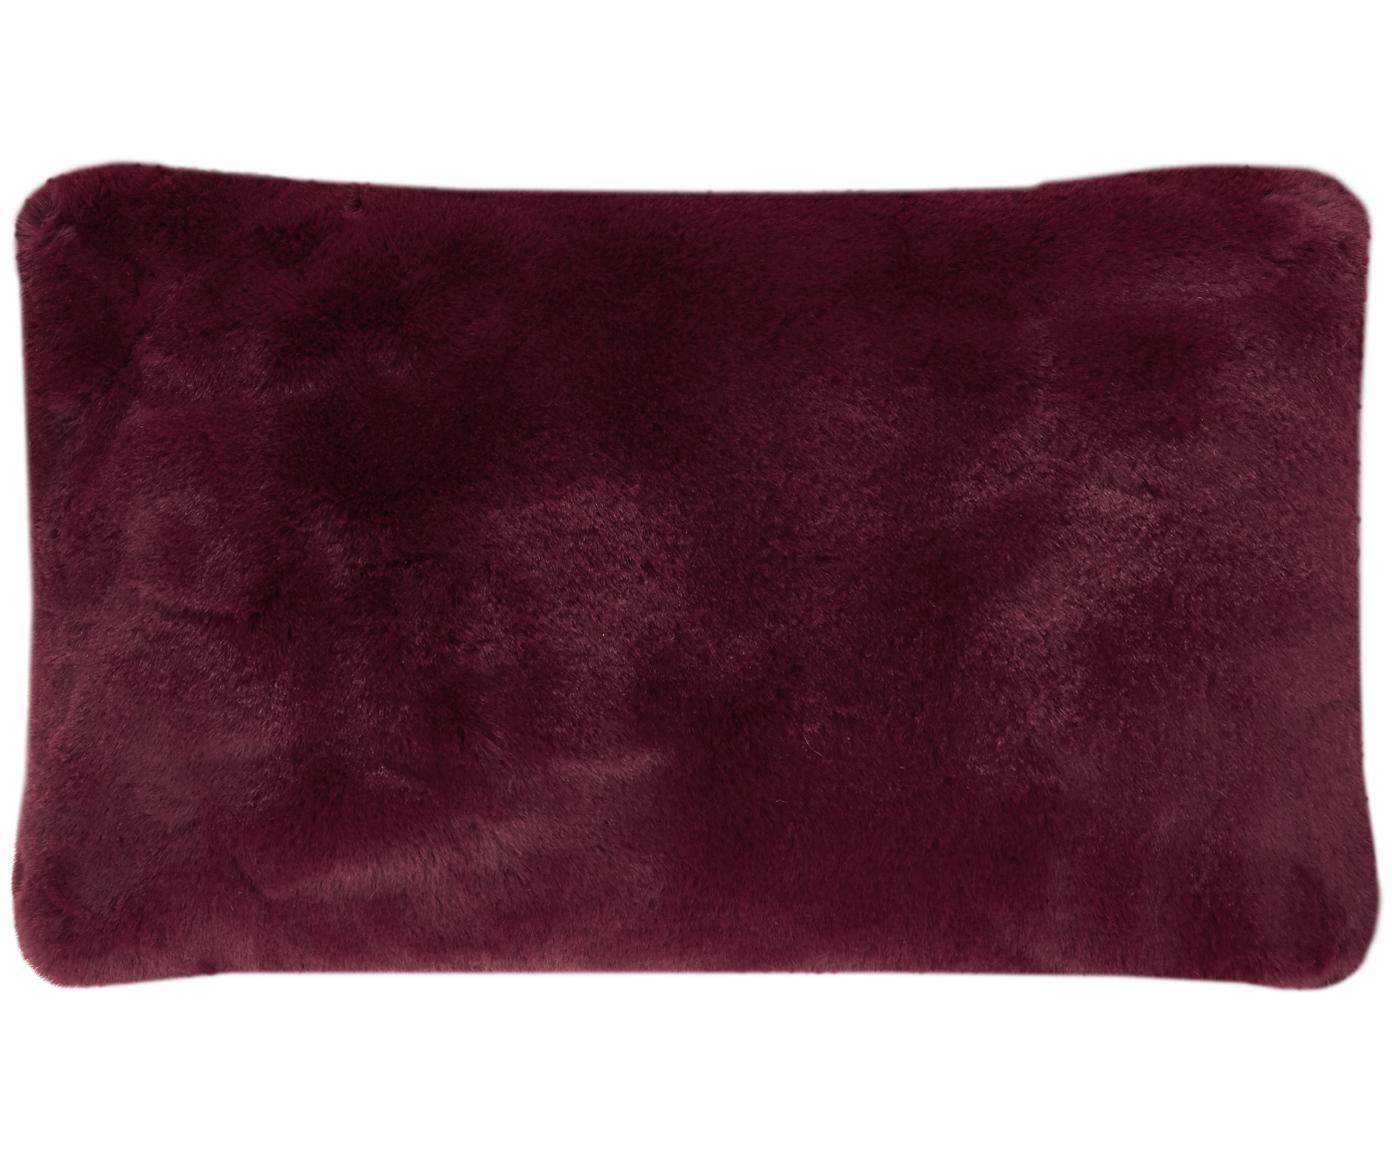 Funda de cojín de piel sintética Mette, Parte delantera: 100%poliéster, Parte trasera: 100%poliéster, Rojo oscuro, An 30 x L 50 cm